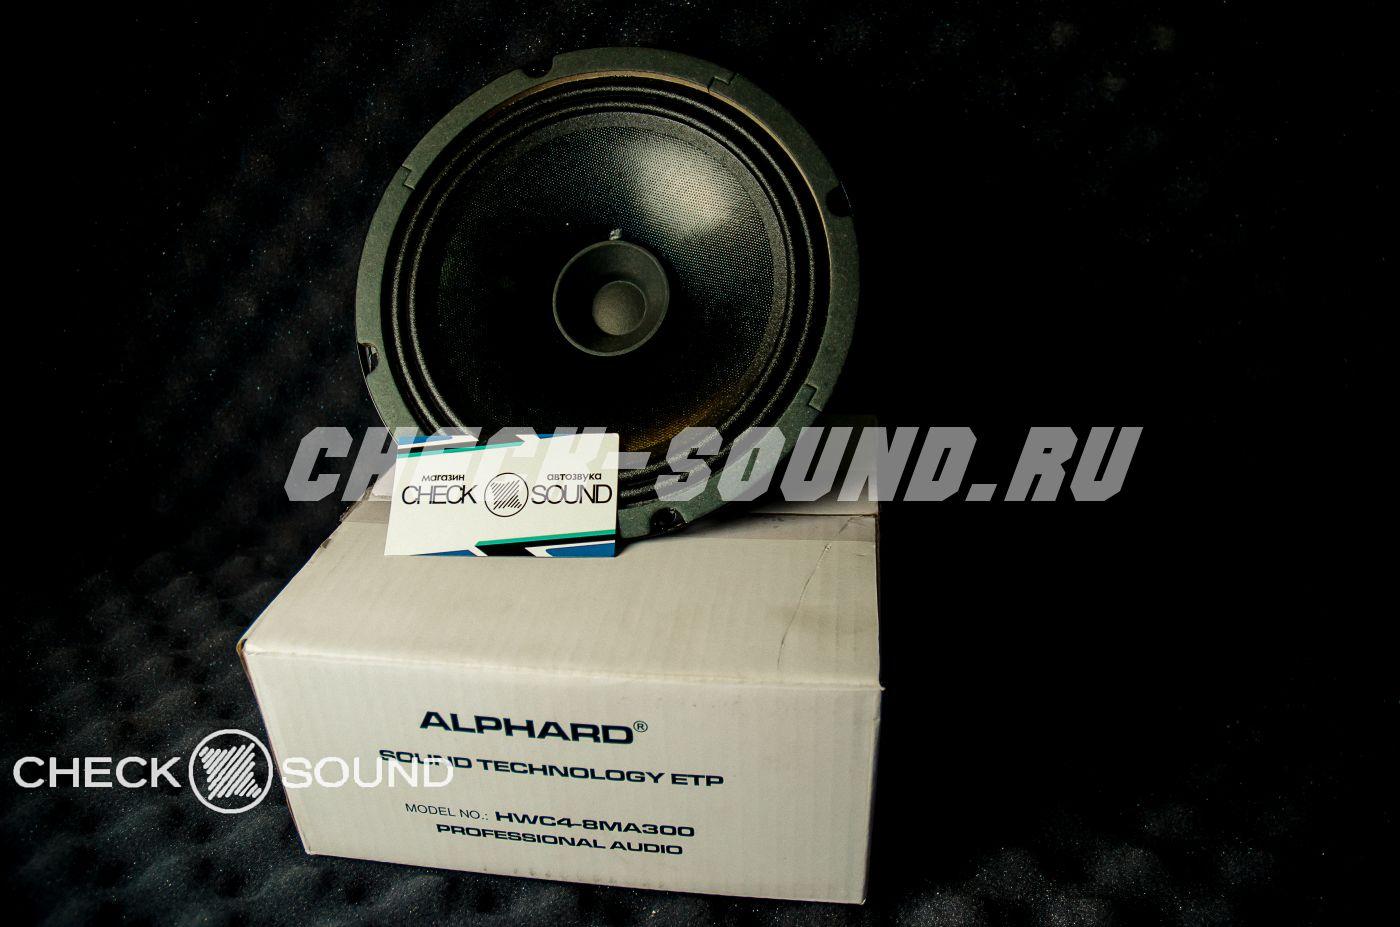 ALPHARD HWC4-8MA300